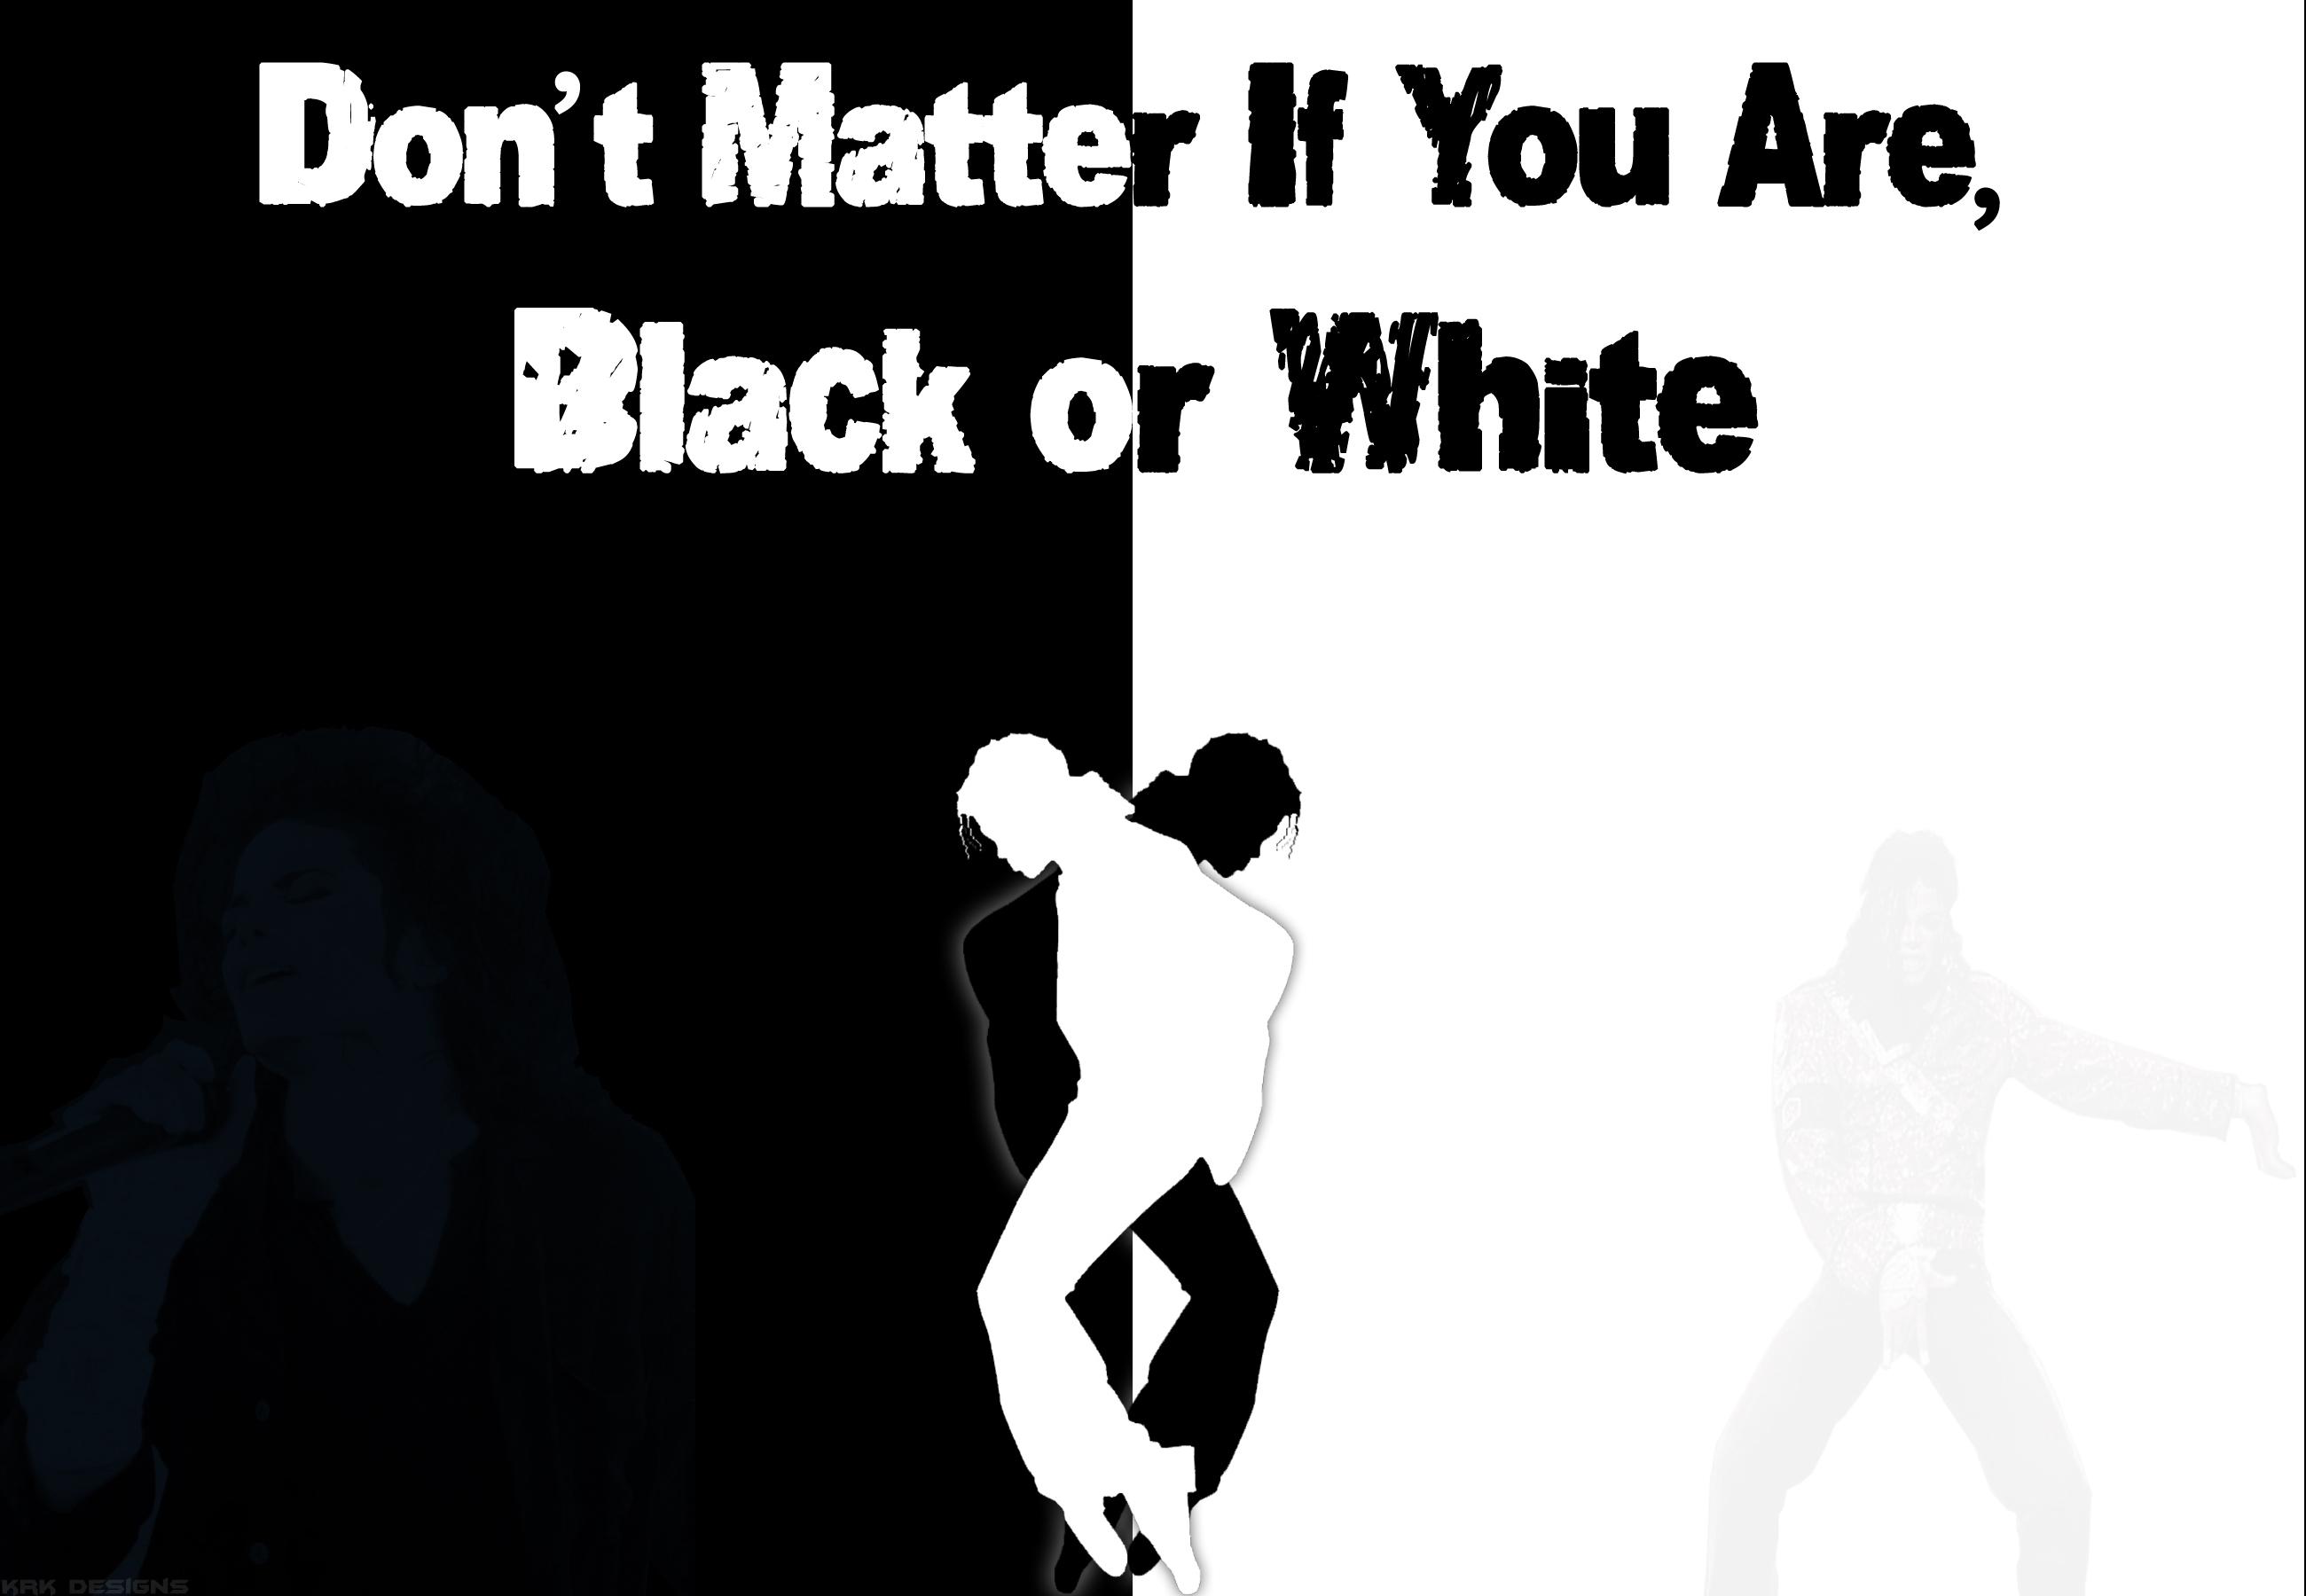 Black or white michael jackson essay